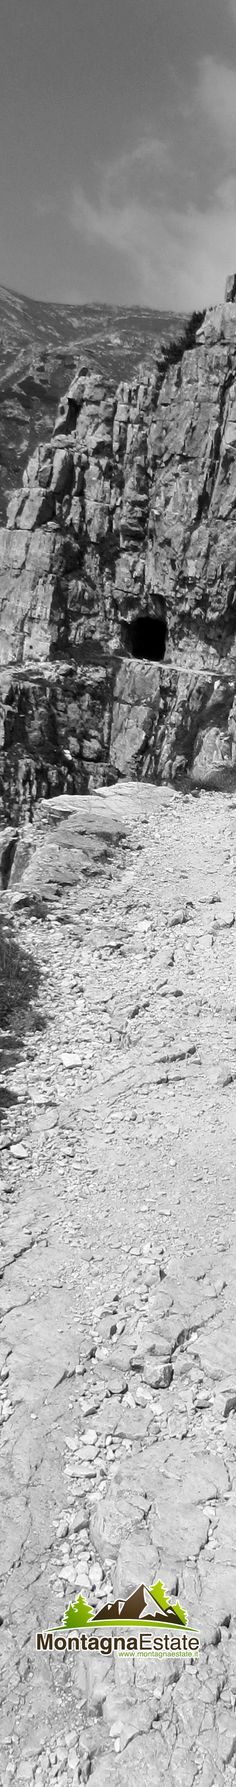 Mount Pasubio #alps #italy